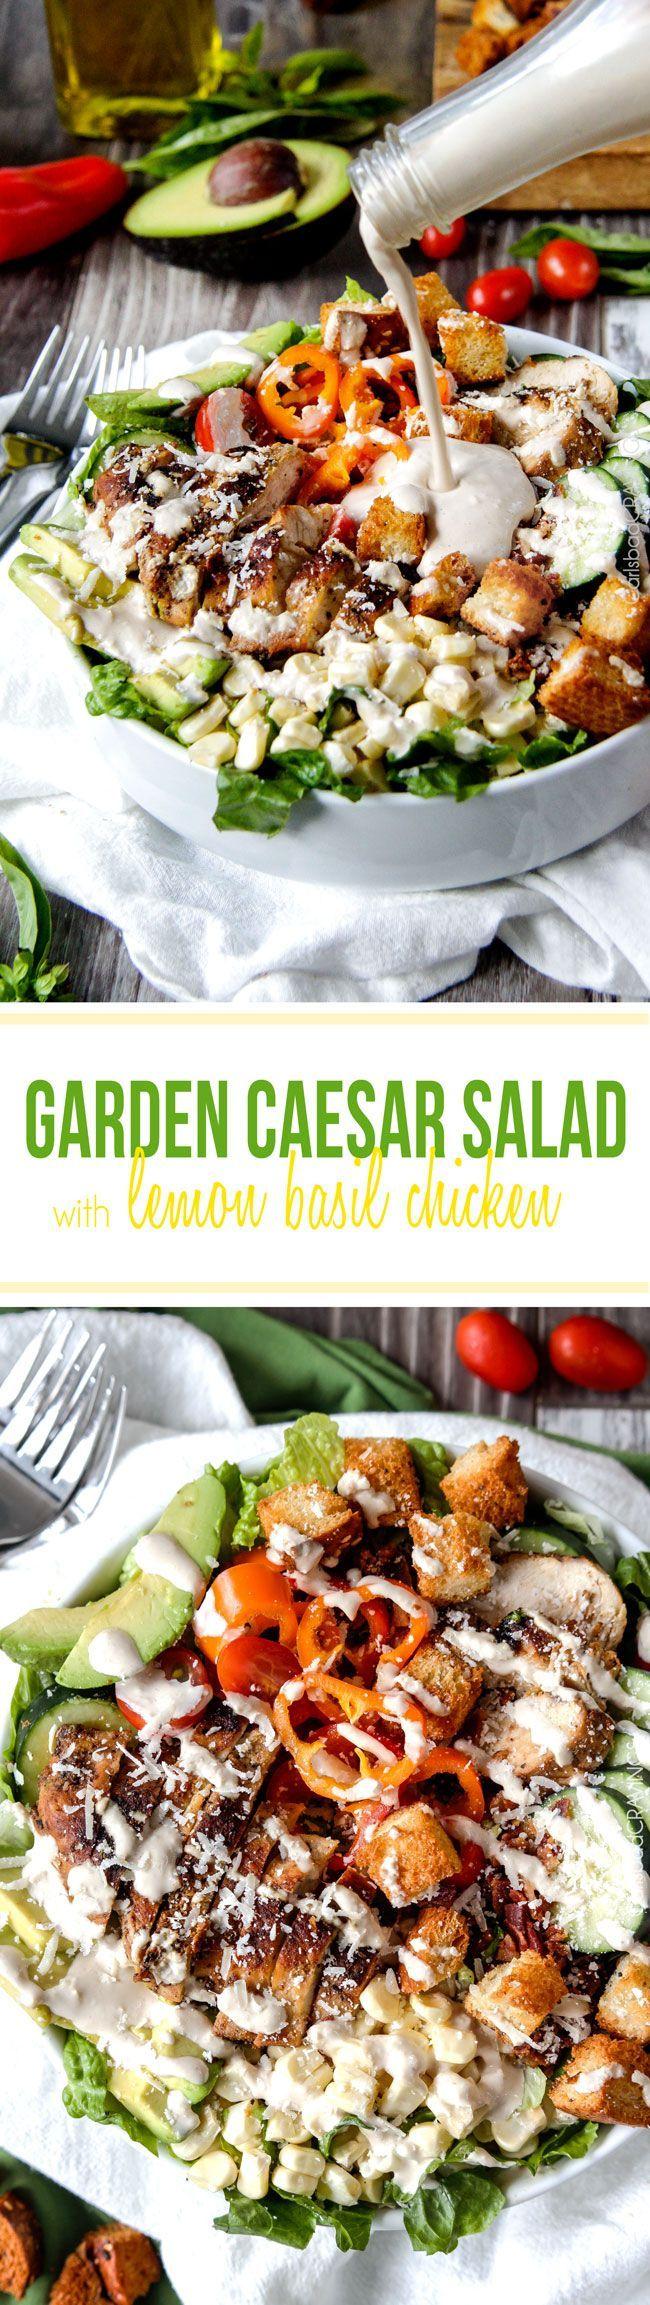 17 Best Images About Salad On Pinterest Caesar Salad